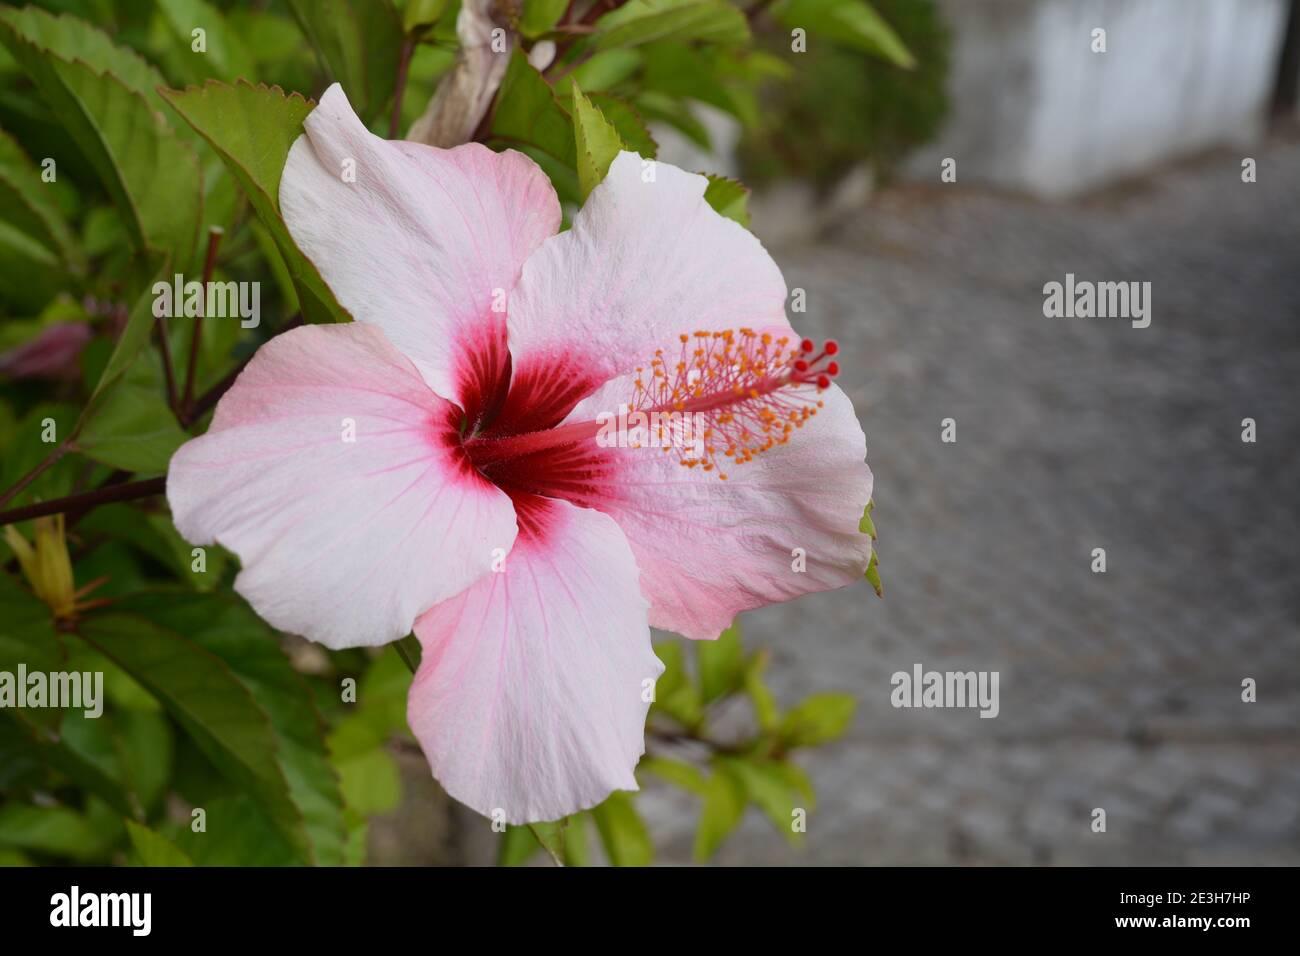 Fiore di Hibiscus in fiore Foto Stock